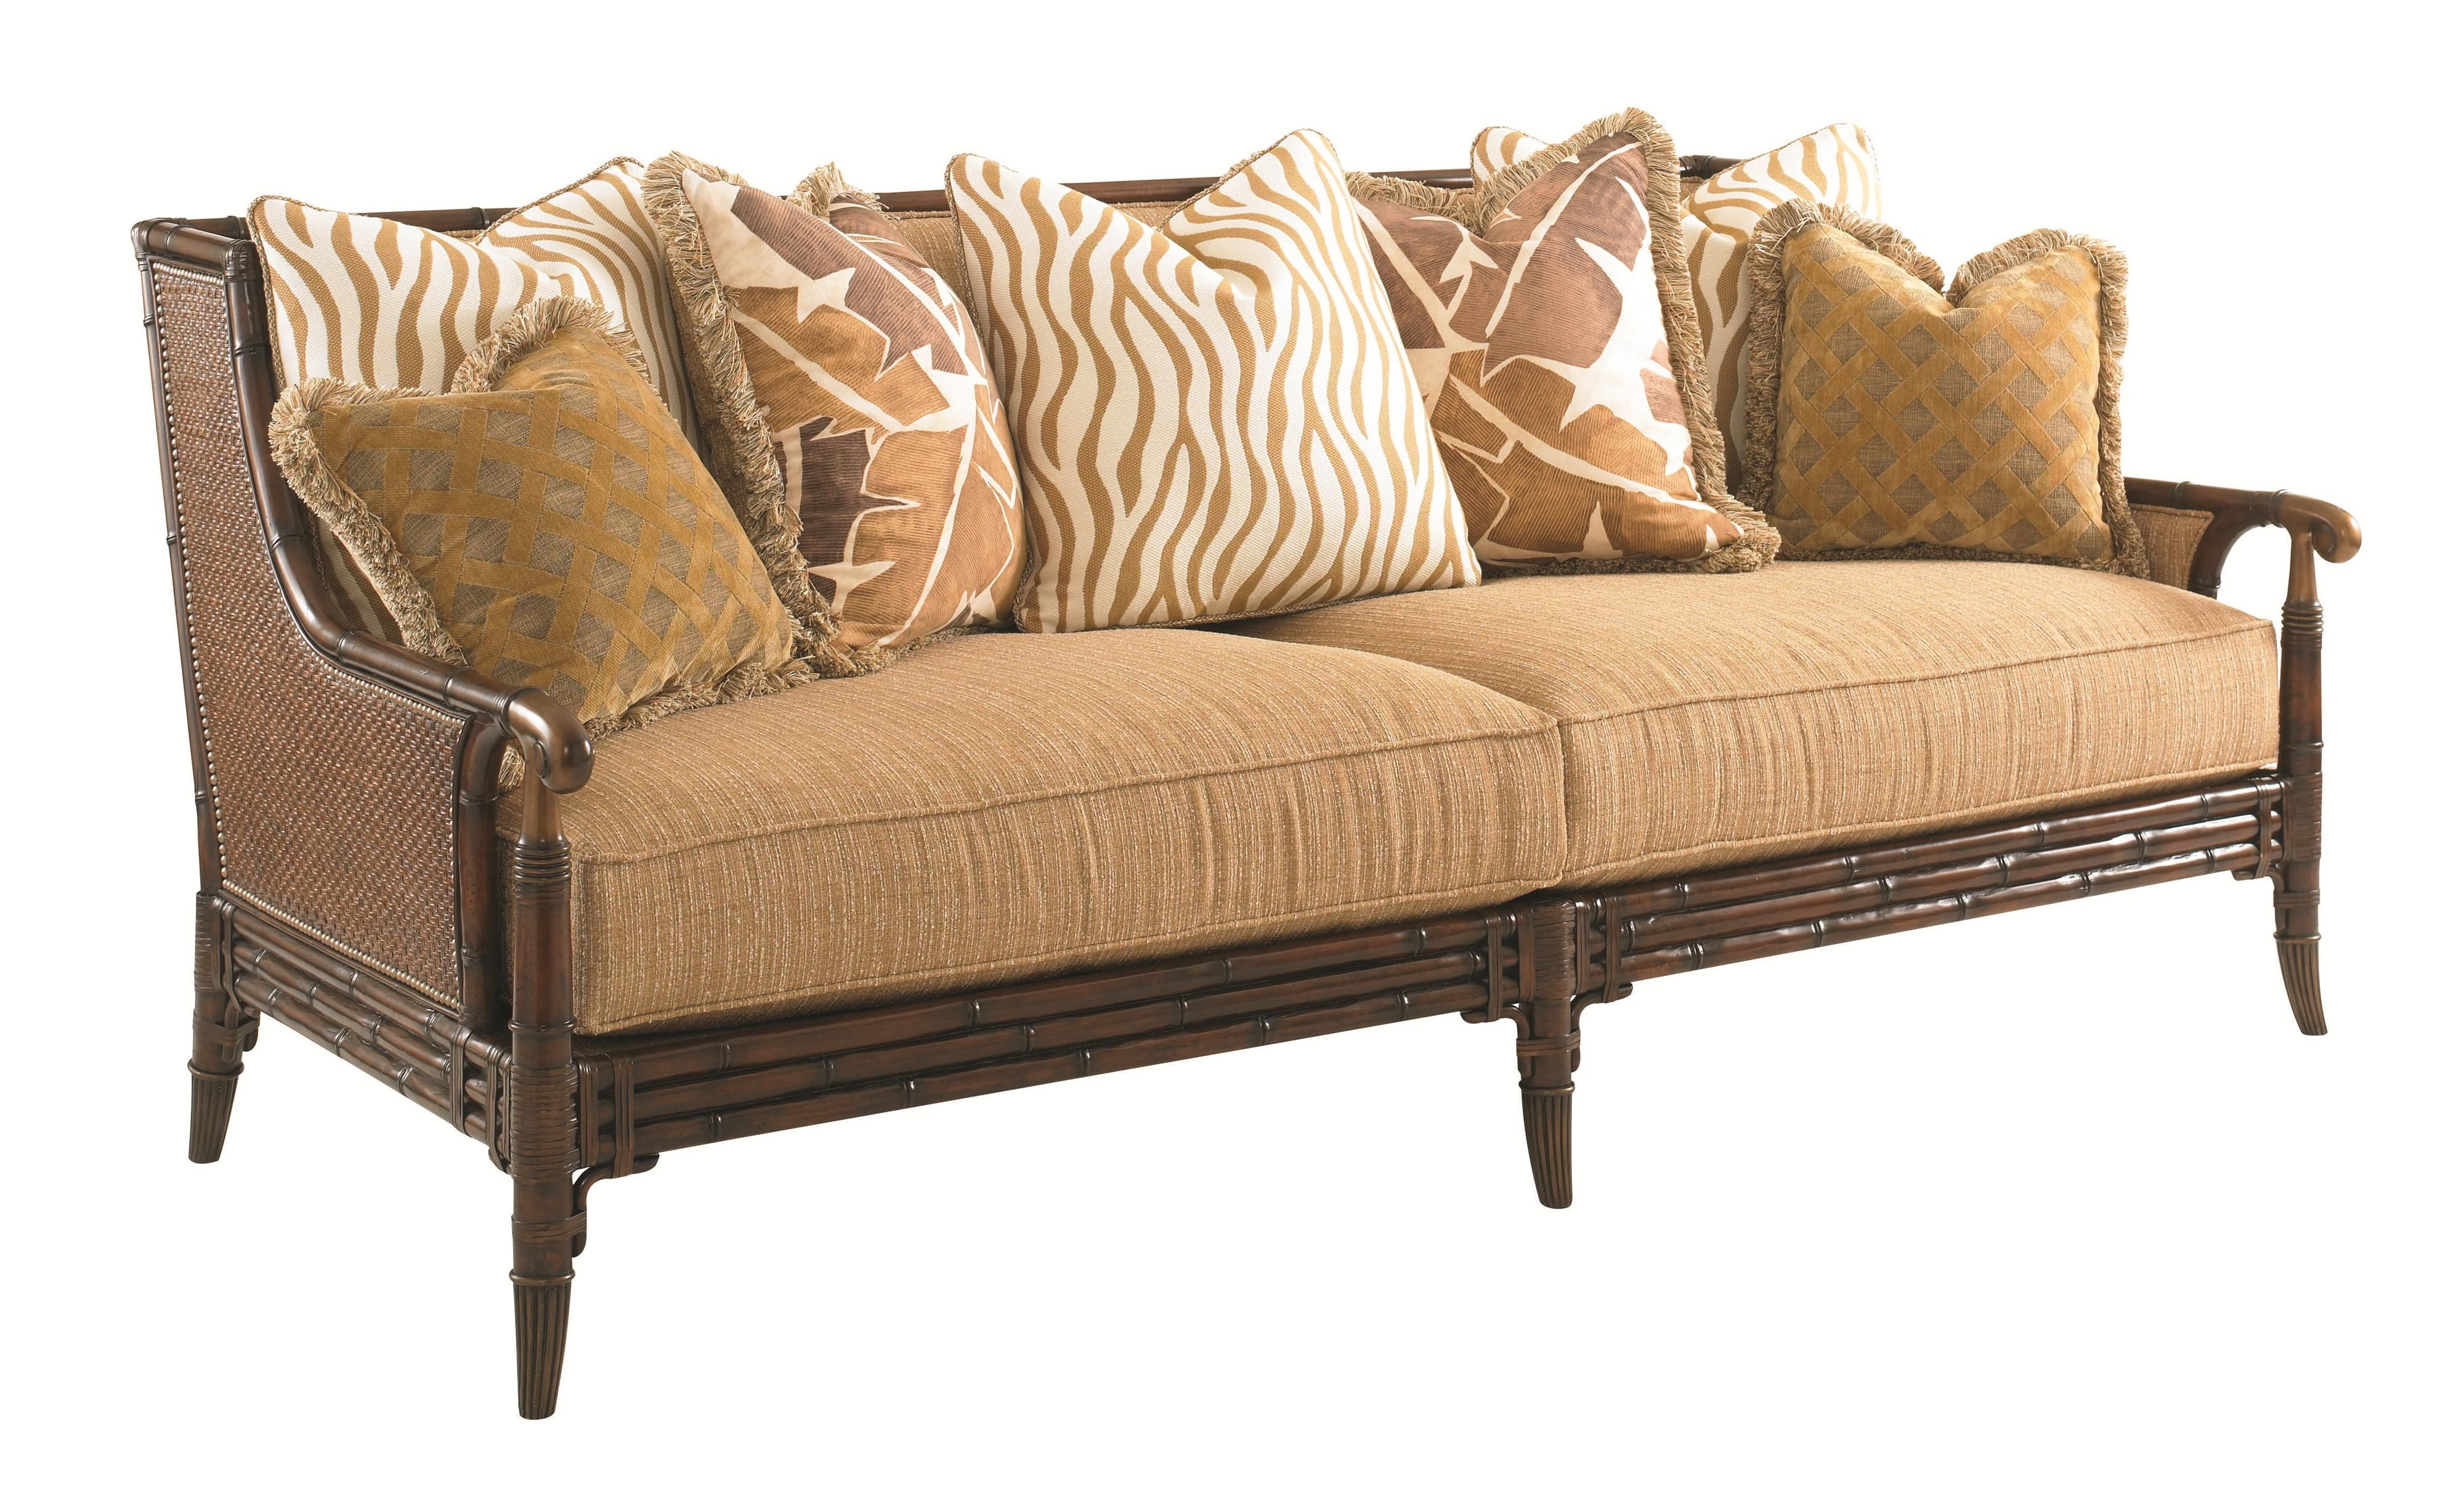 Landara Las Palmas Sofa By Tommy Bahama Home Tommy Bahama Furniture Furniture Goods Home Furnishings